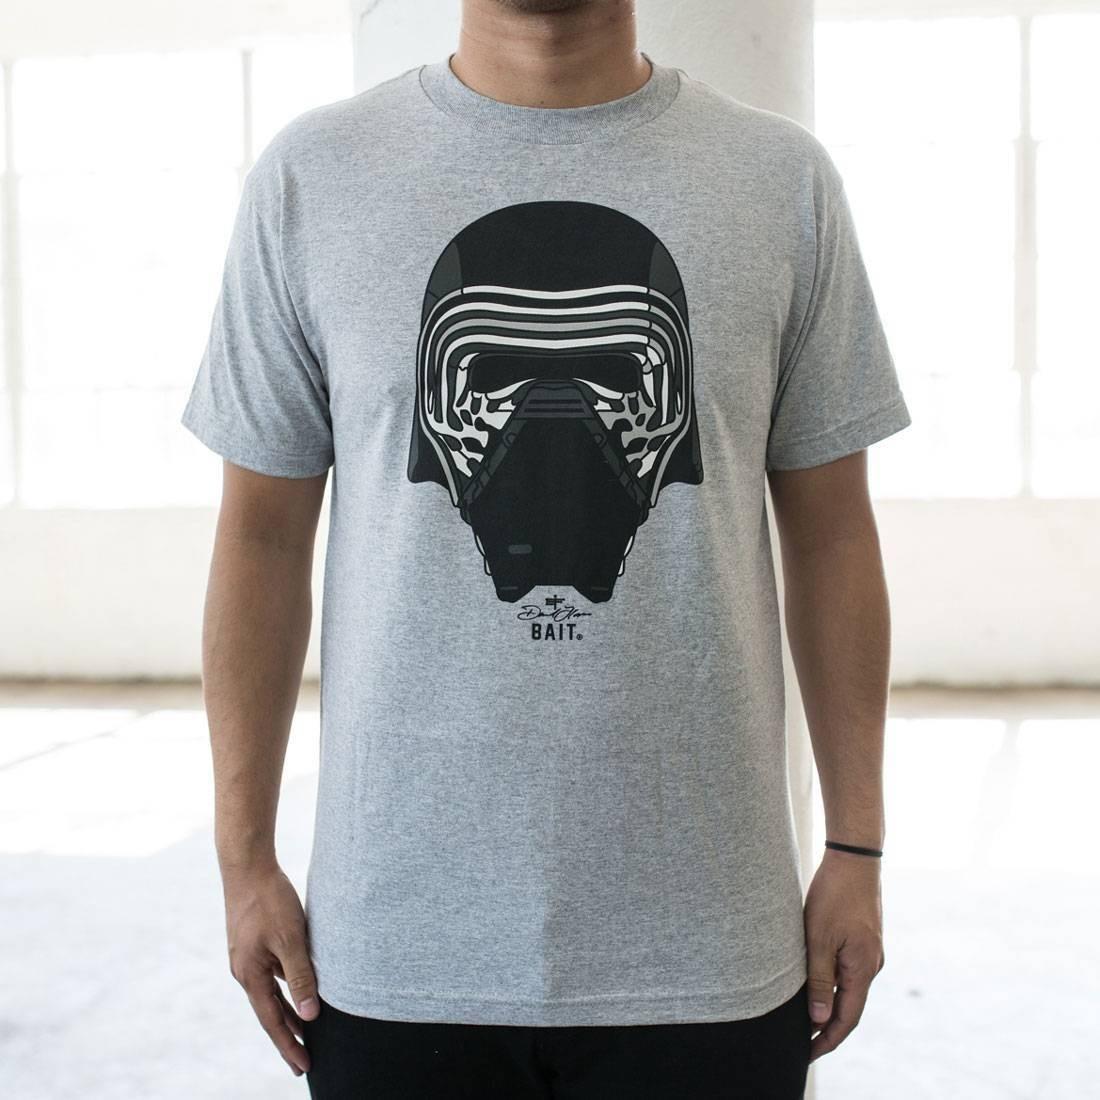 BAIT x David Flores Kylo Ren Tee (gray / heather)